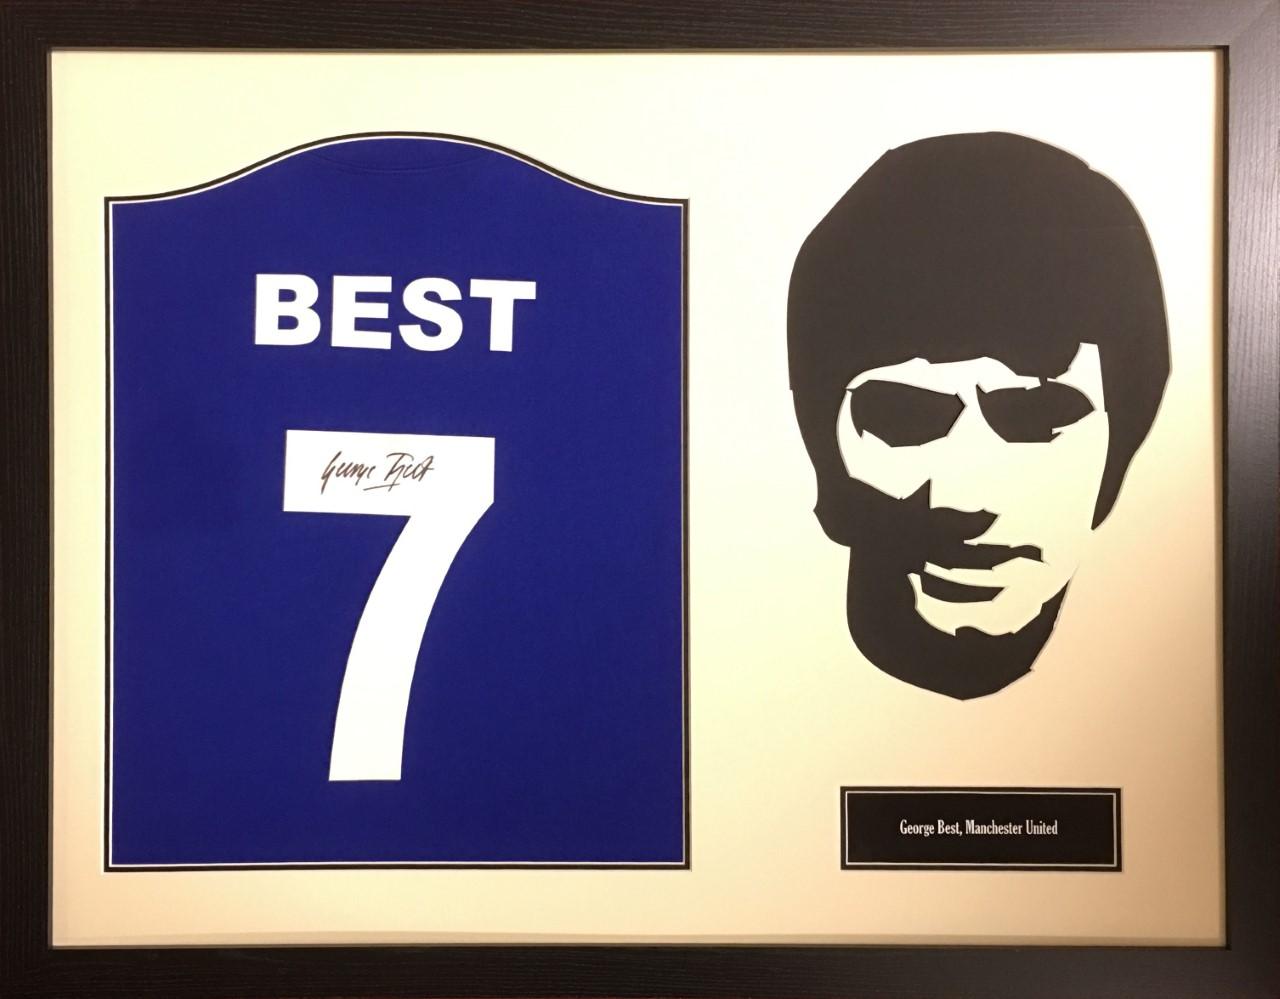 110ac1f03 George Best Signed Manchester United Shirt - Framed